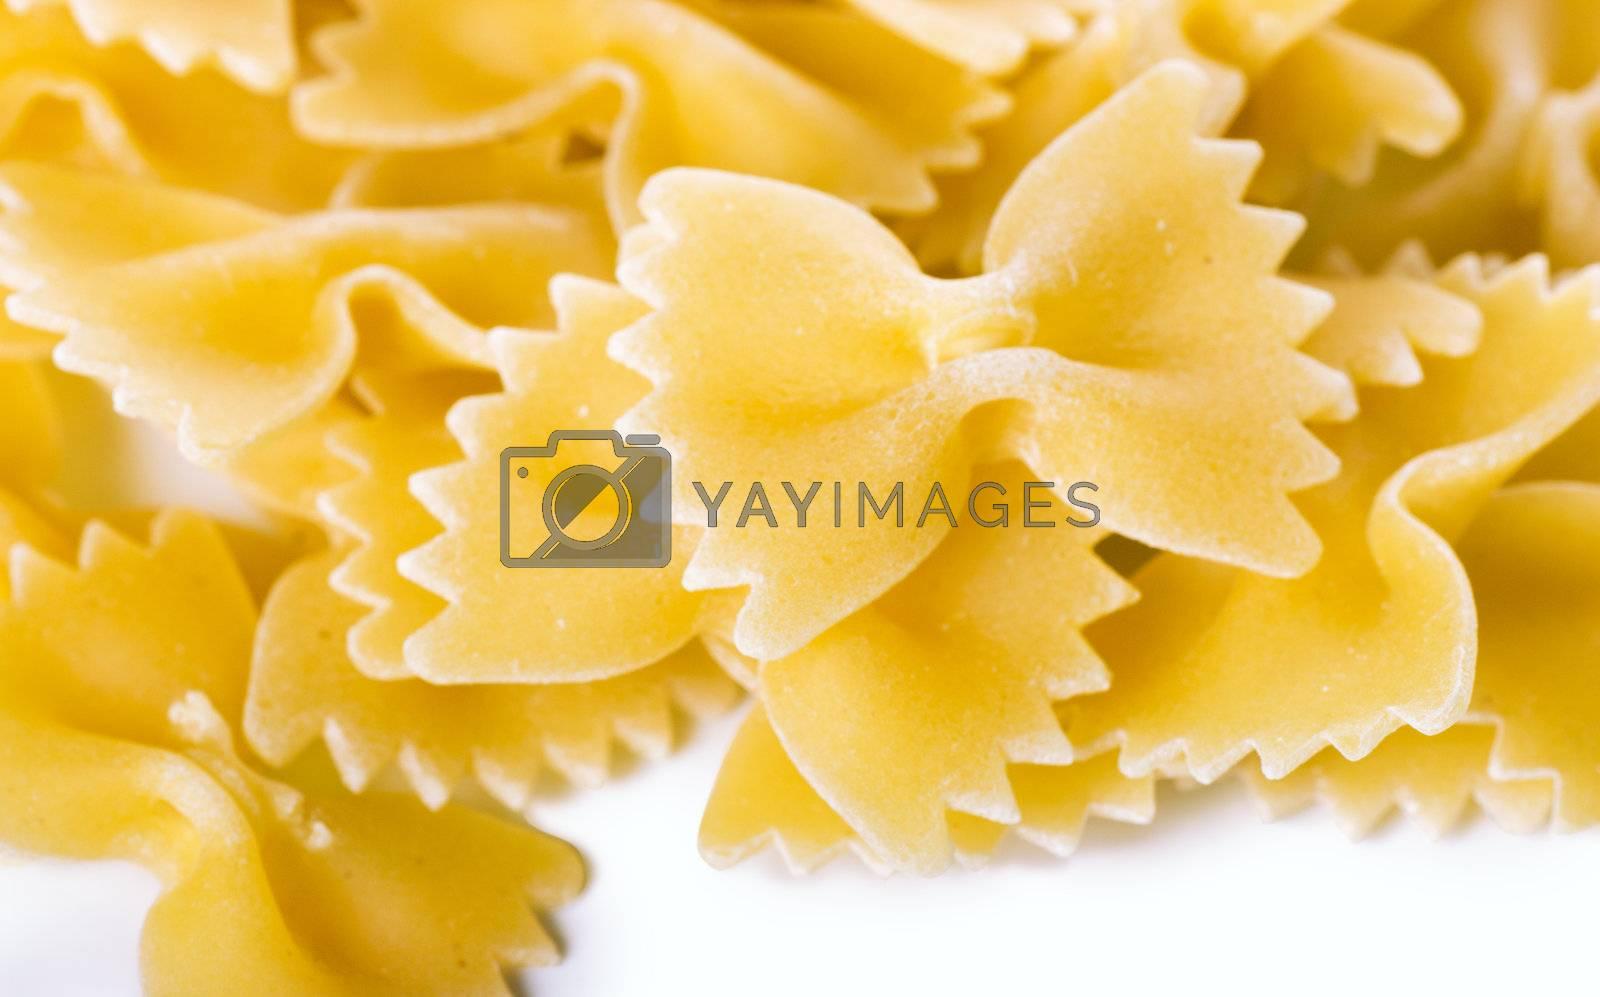 Closeup view of dried bow shaped macaroni